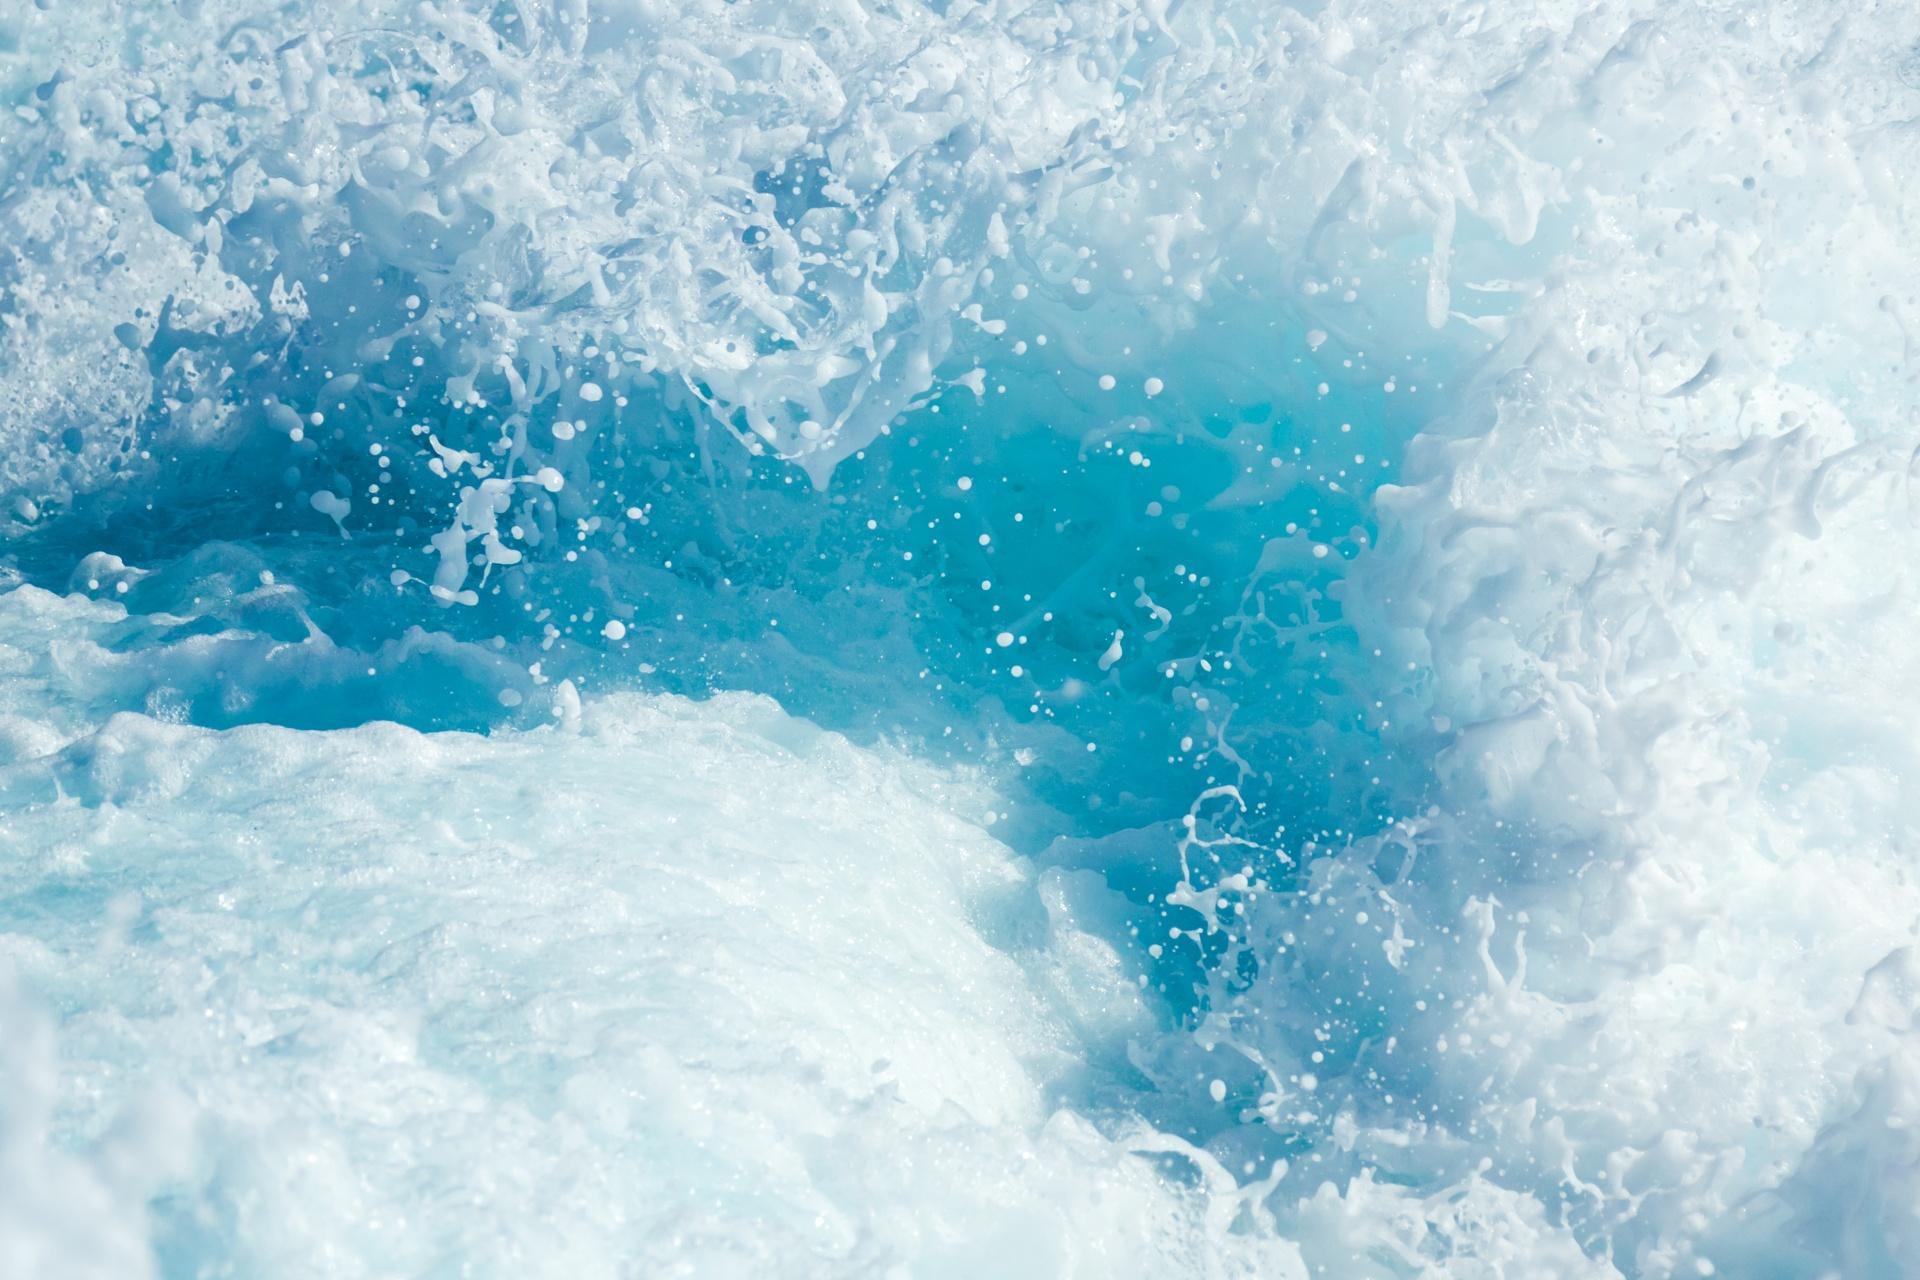 Water Splash Effect wallpaper wallpaper free download